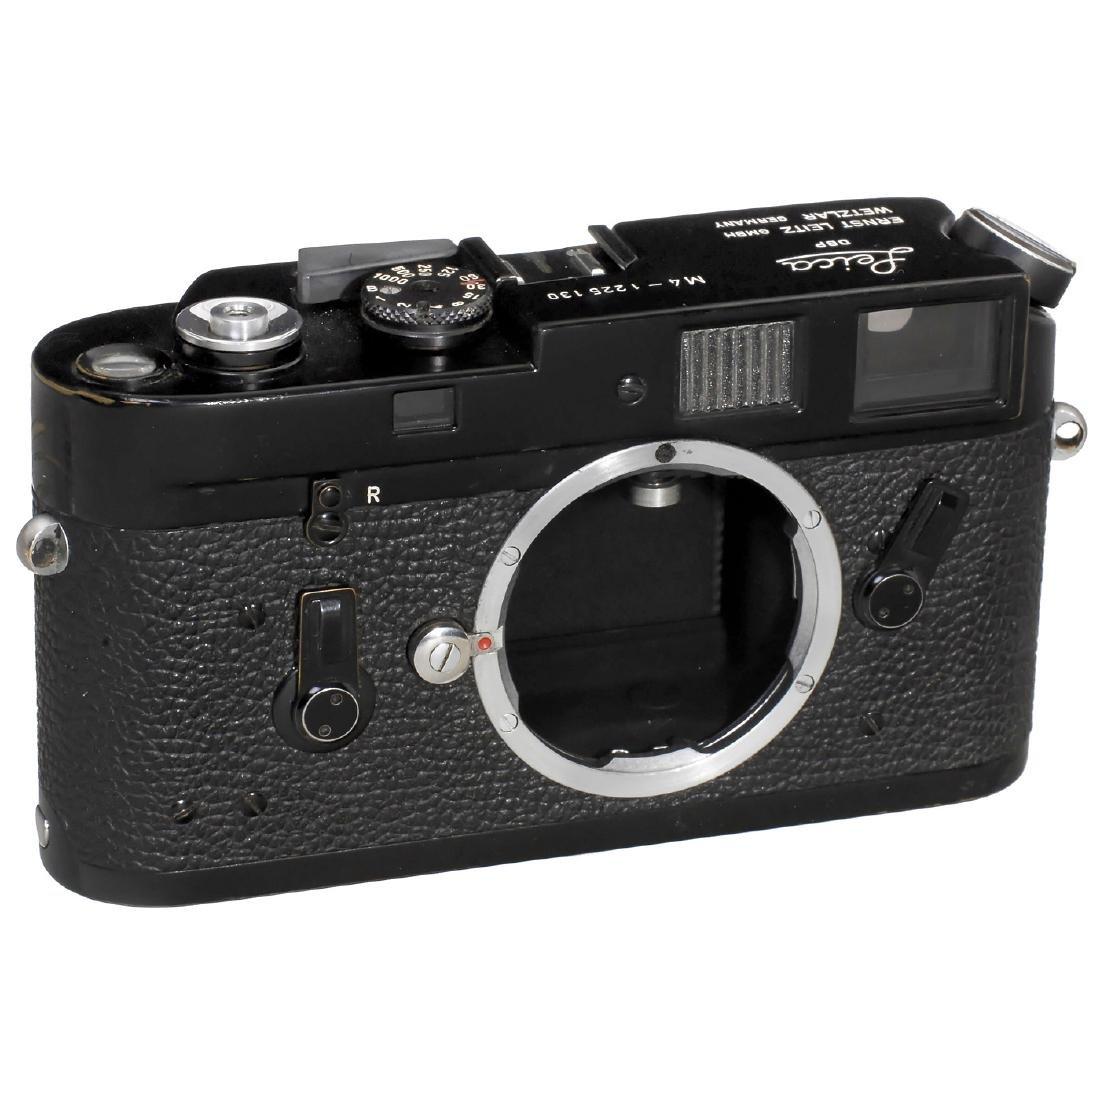 Leica M4 Body (Black Paint), 1969